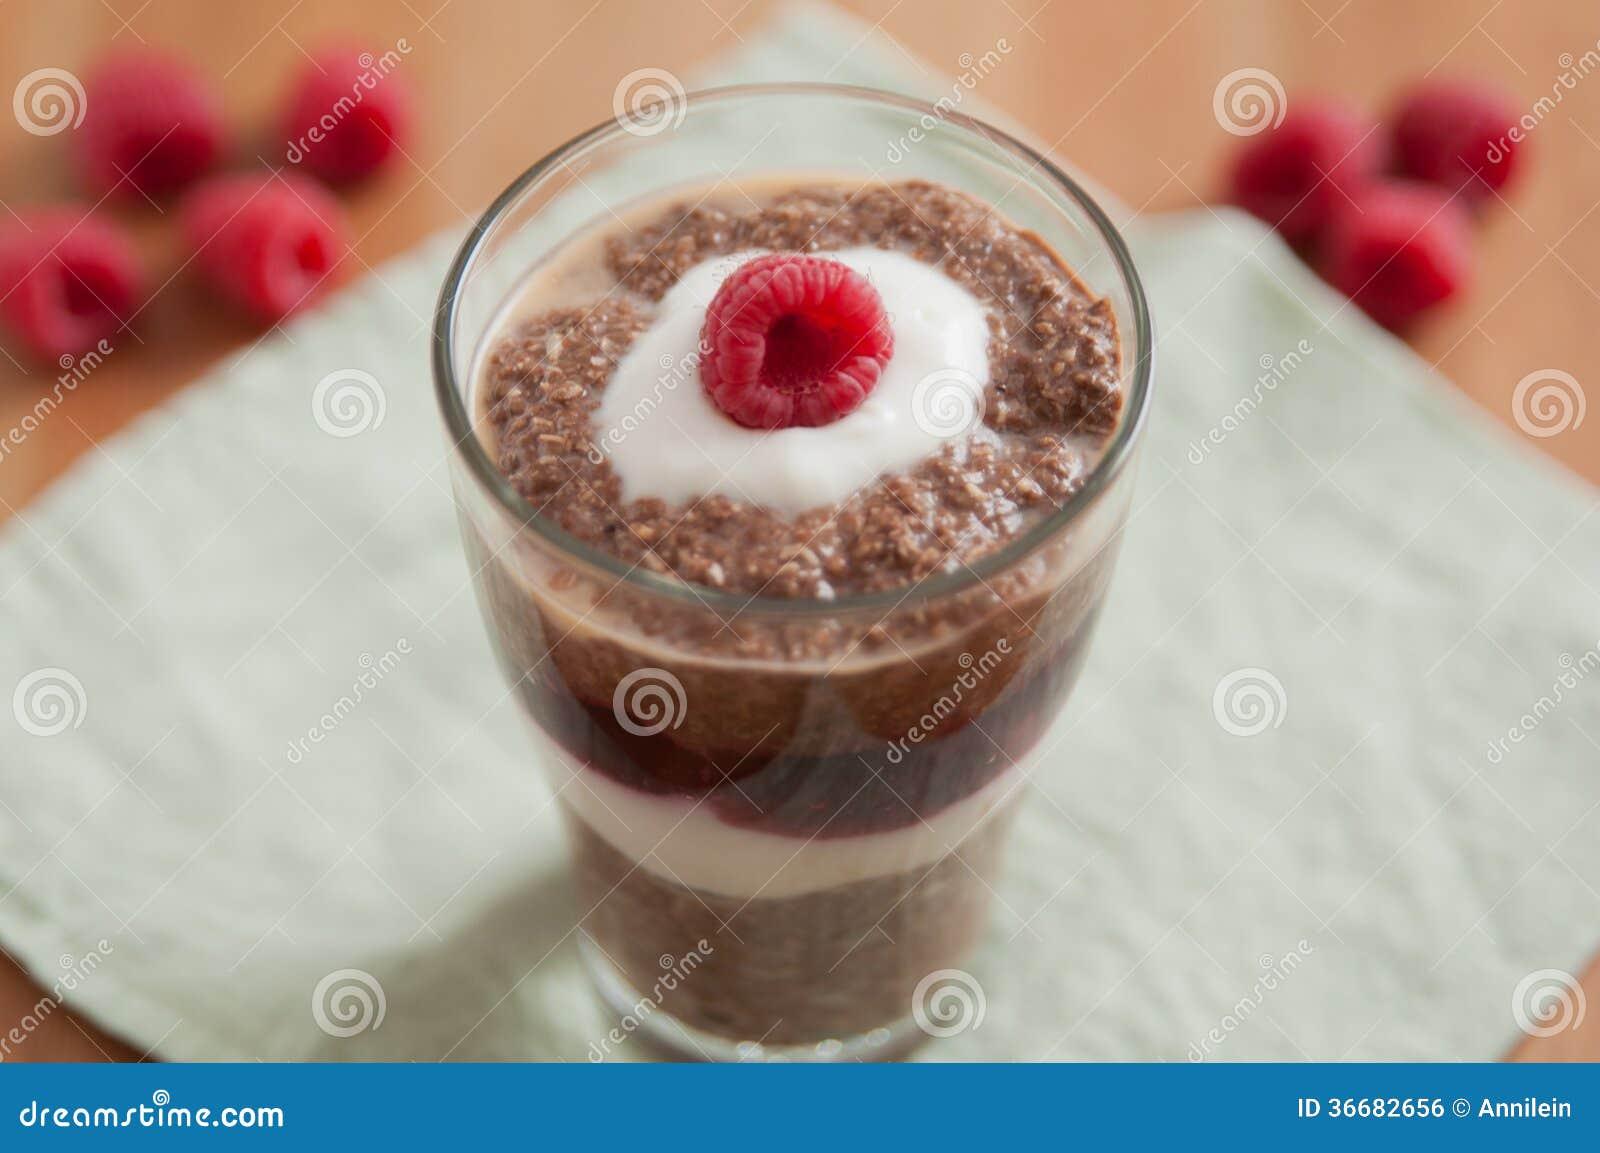 Chocolate Chia Pudding Dessert